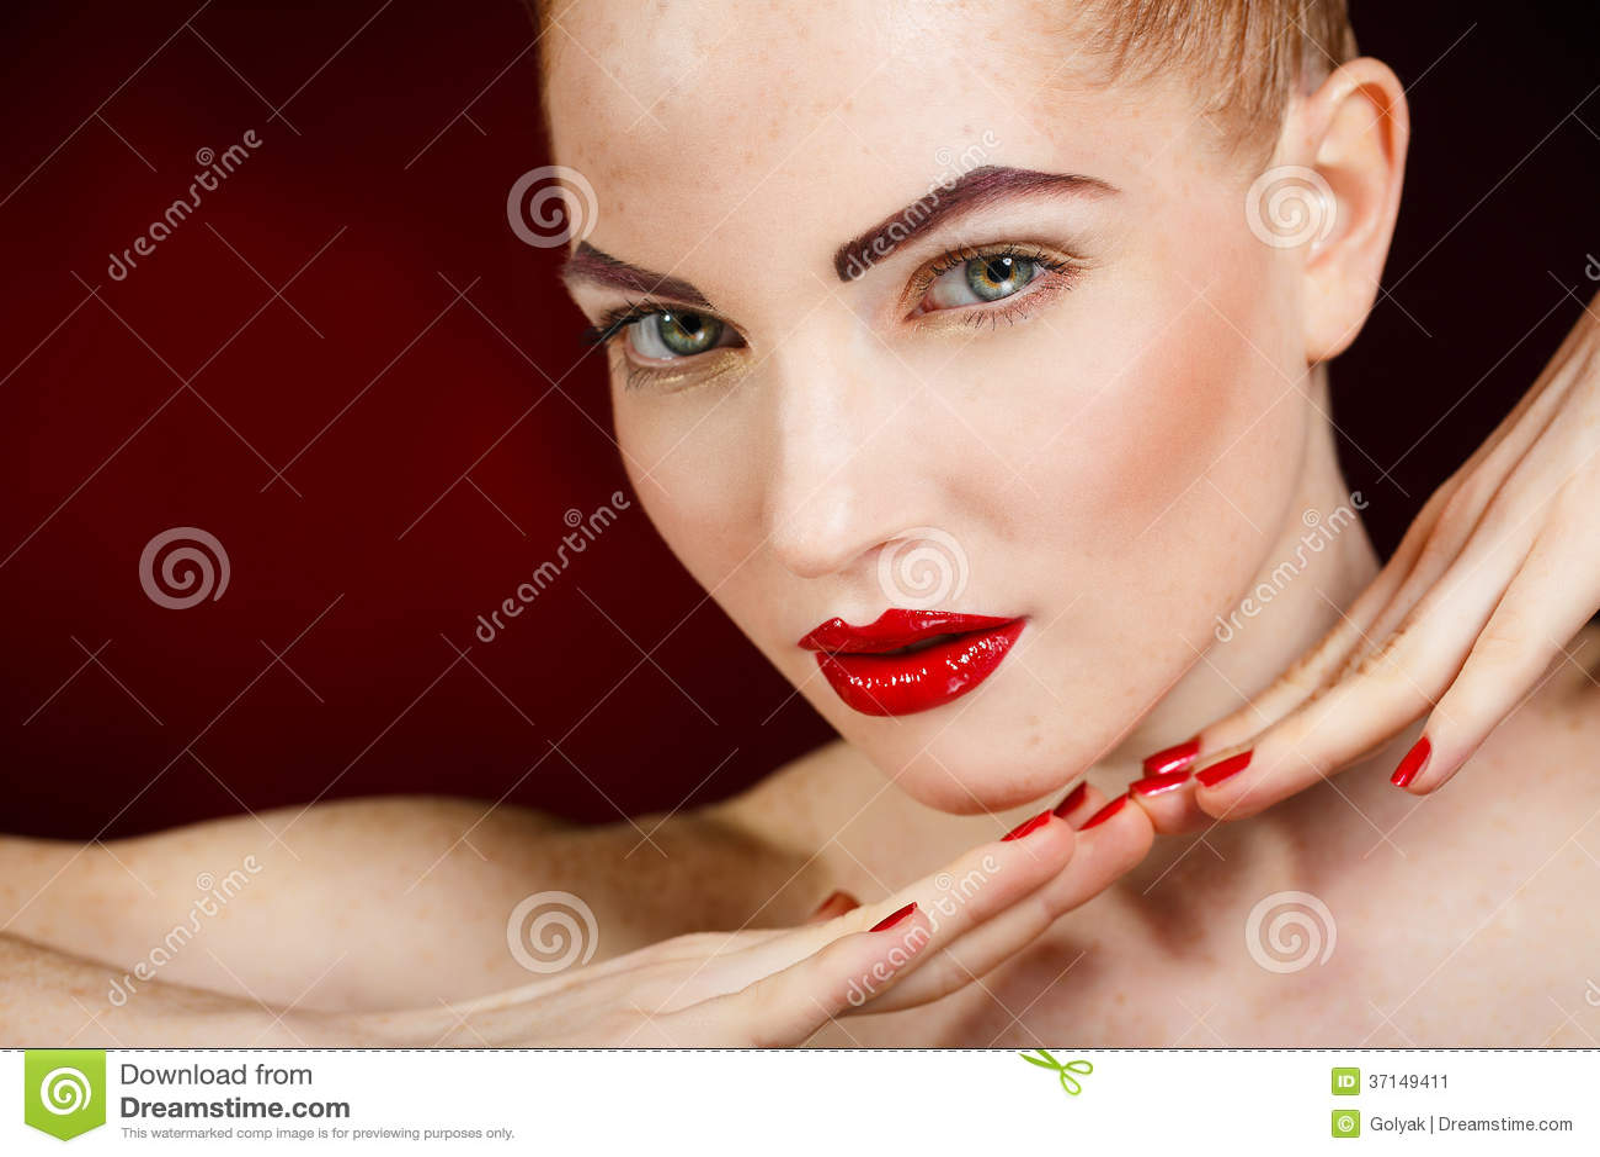 Beauty Makeup Fashion Model On Mirror Reflection Stock